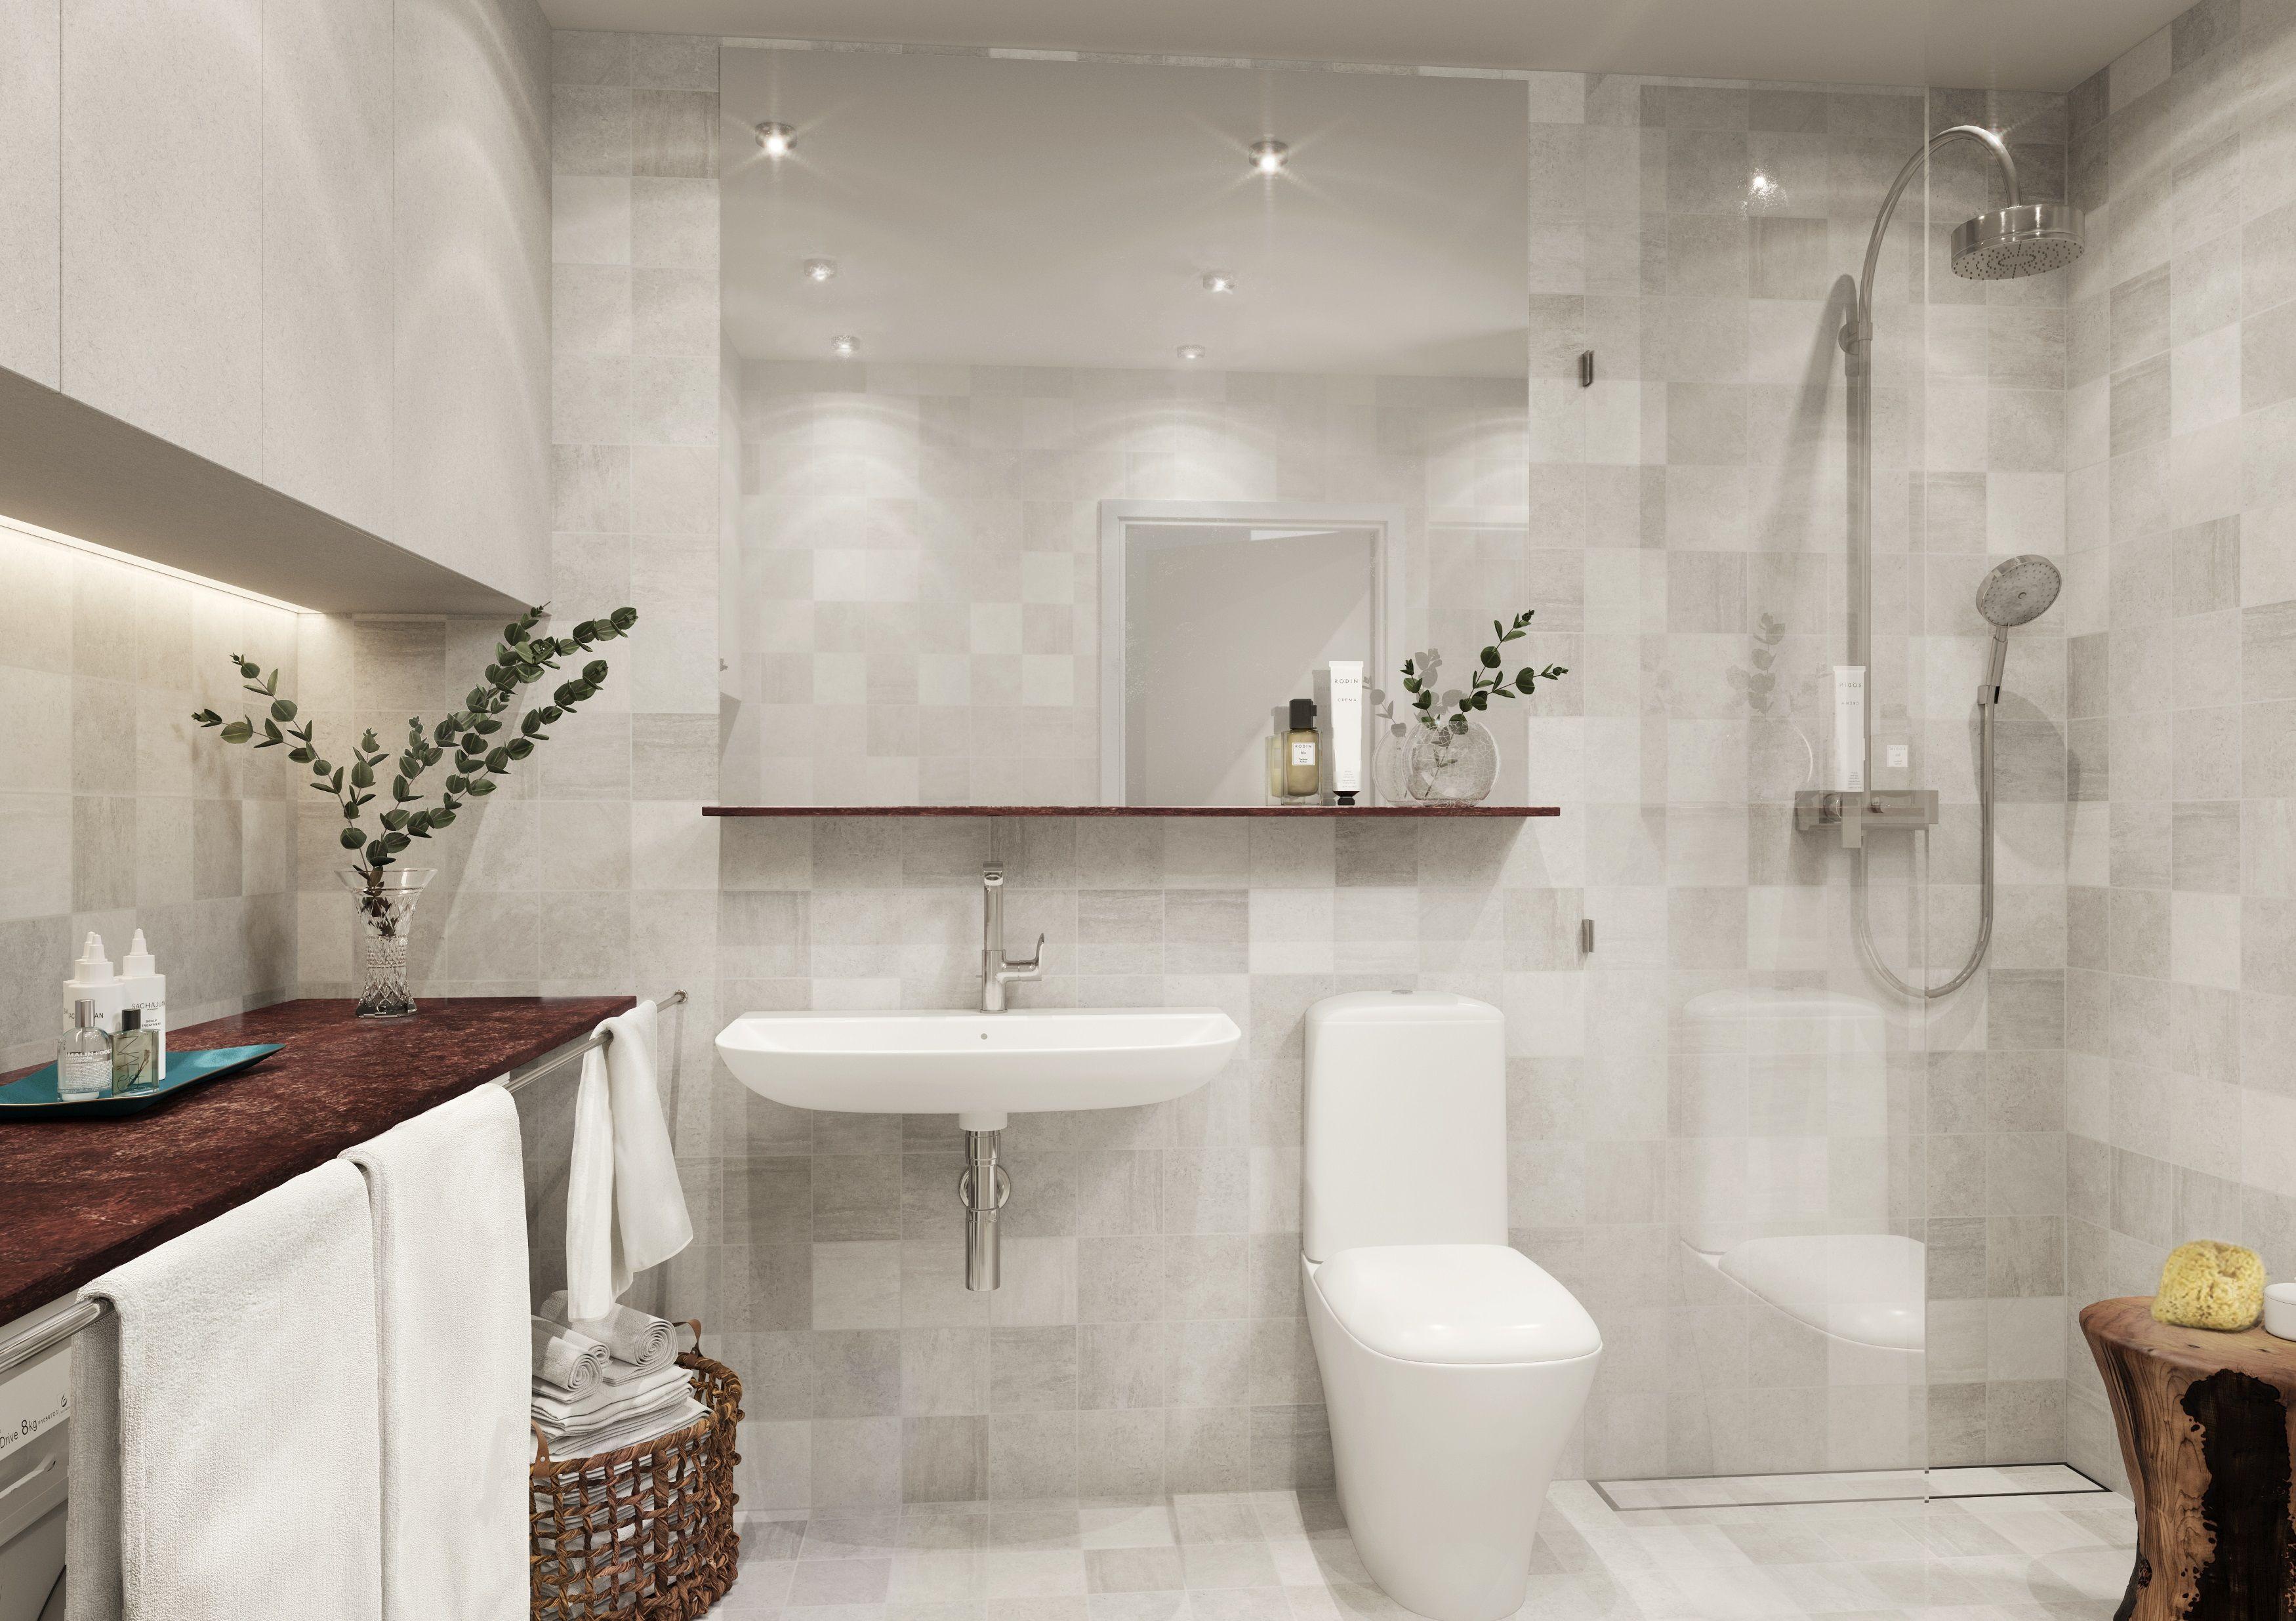 Tobin properties: #tobinproperties badrum med utvalda, hållbara ...